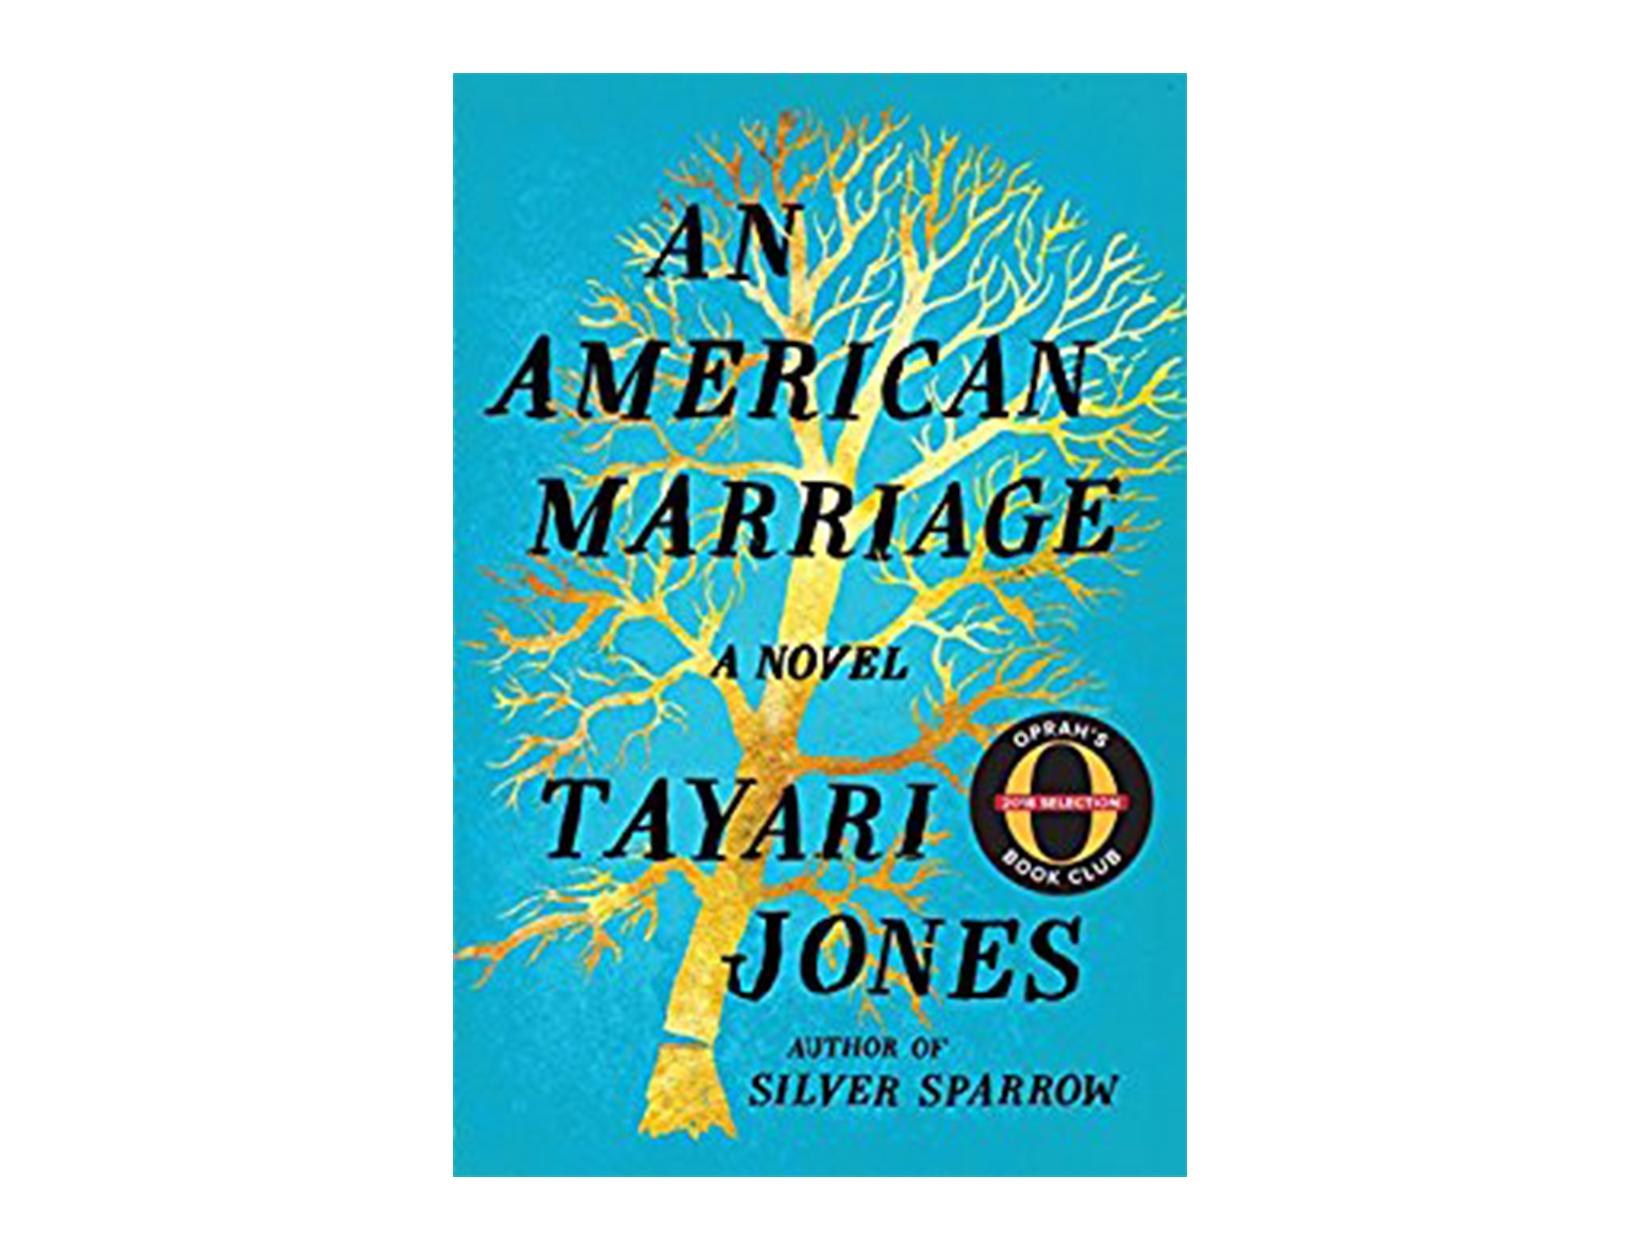 <em>An American Marriage</em> by Tayari Jones